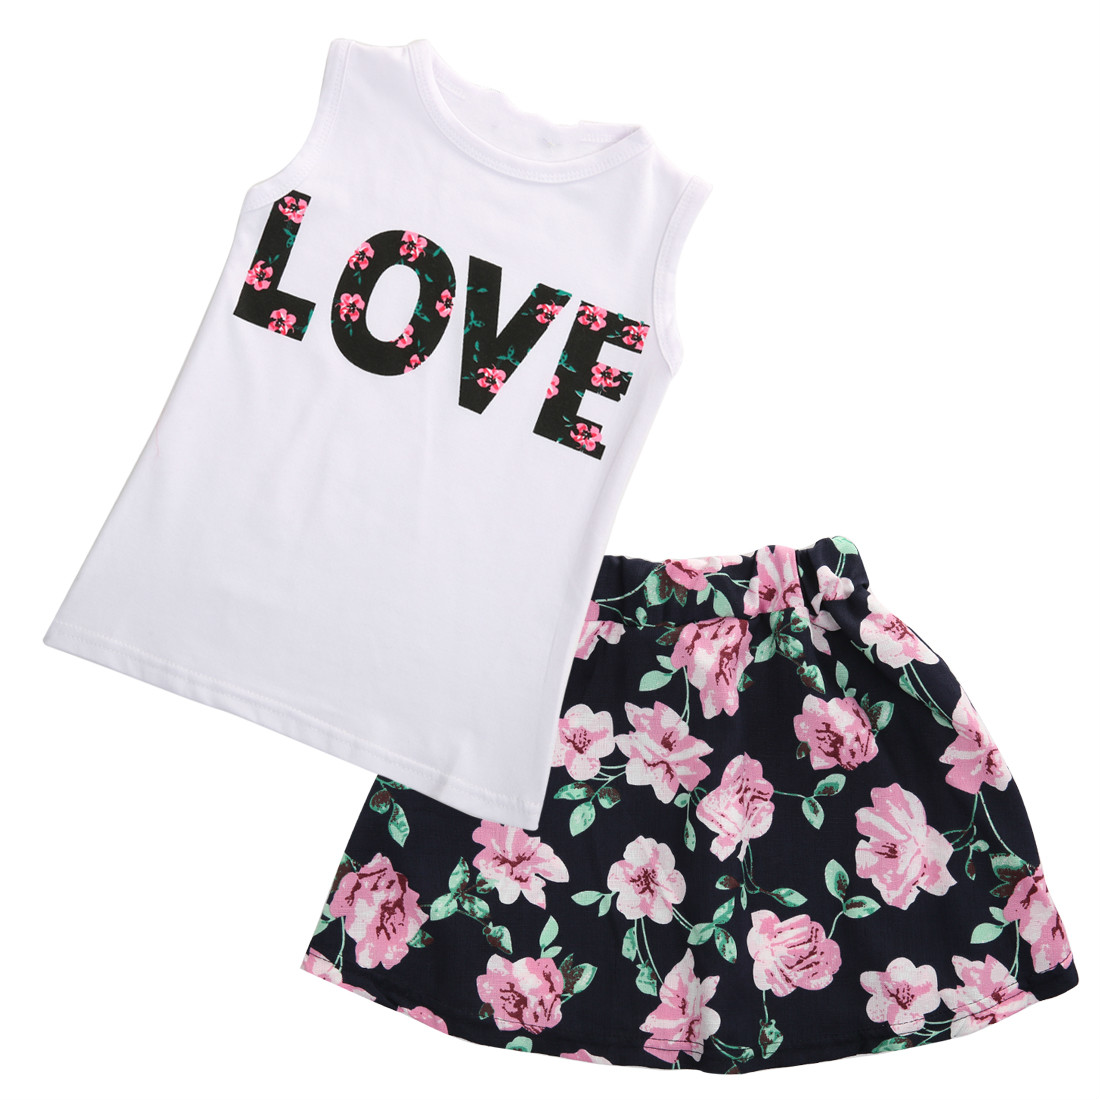 2pcs Summer Toddler Kids Baby Girls Sleeveless T-shirt Tank Tops and Floral Print Skirt Sweet Girls Kids Clothes Outfits Set